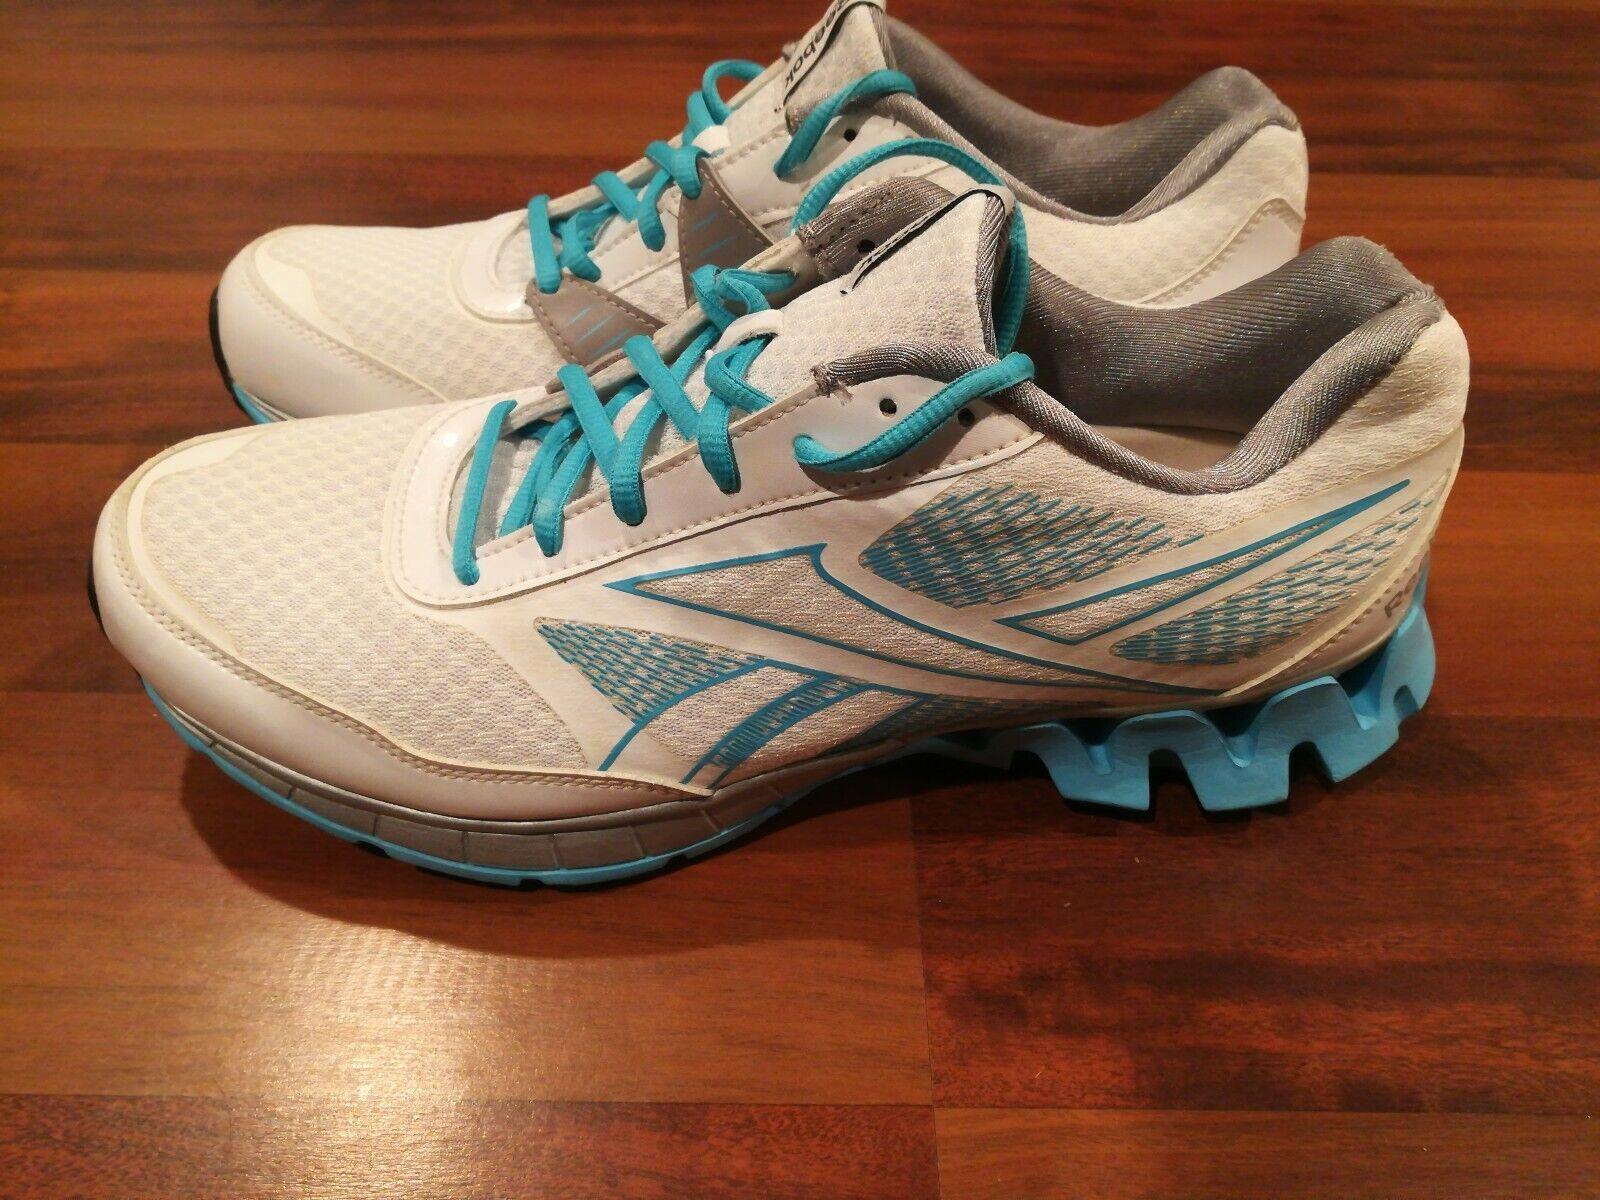 3a6e1ae8 Reebok Zigtech Atlético Zapatos Tenis Para Correr Caminar Para Mujer  blancoo Azul